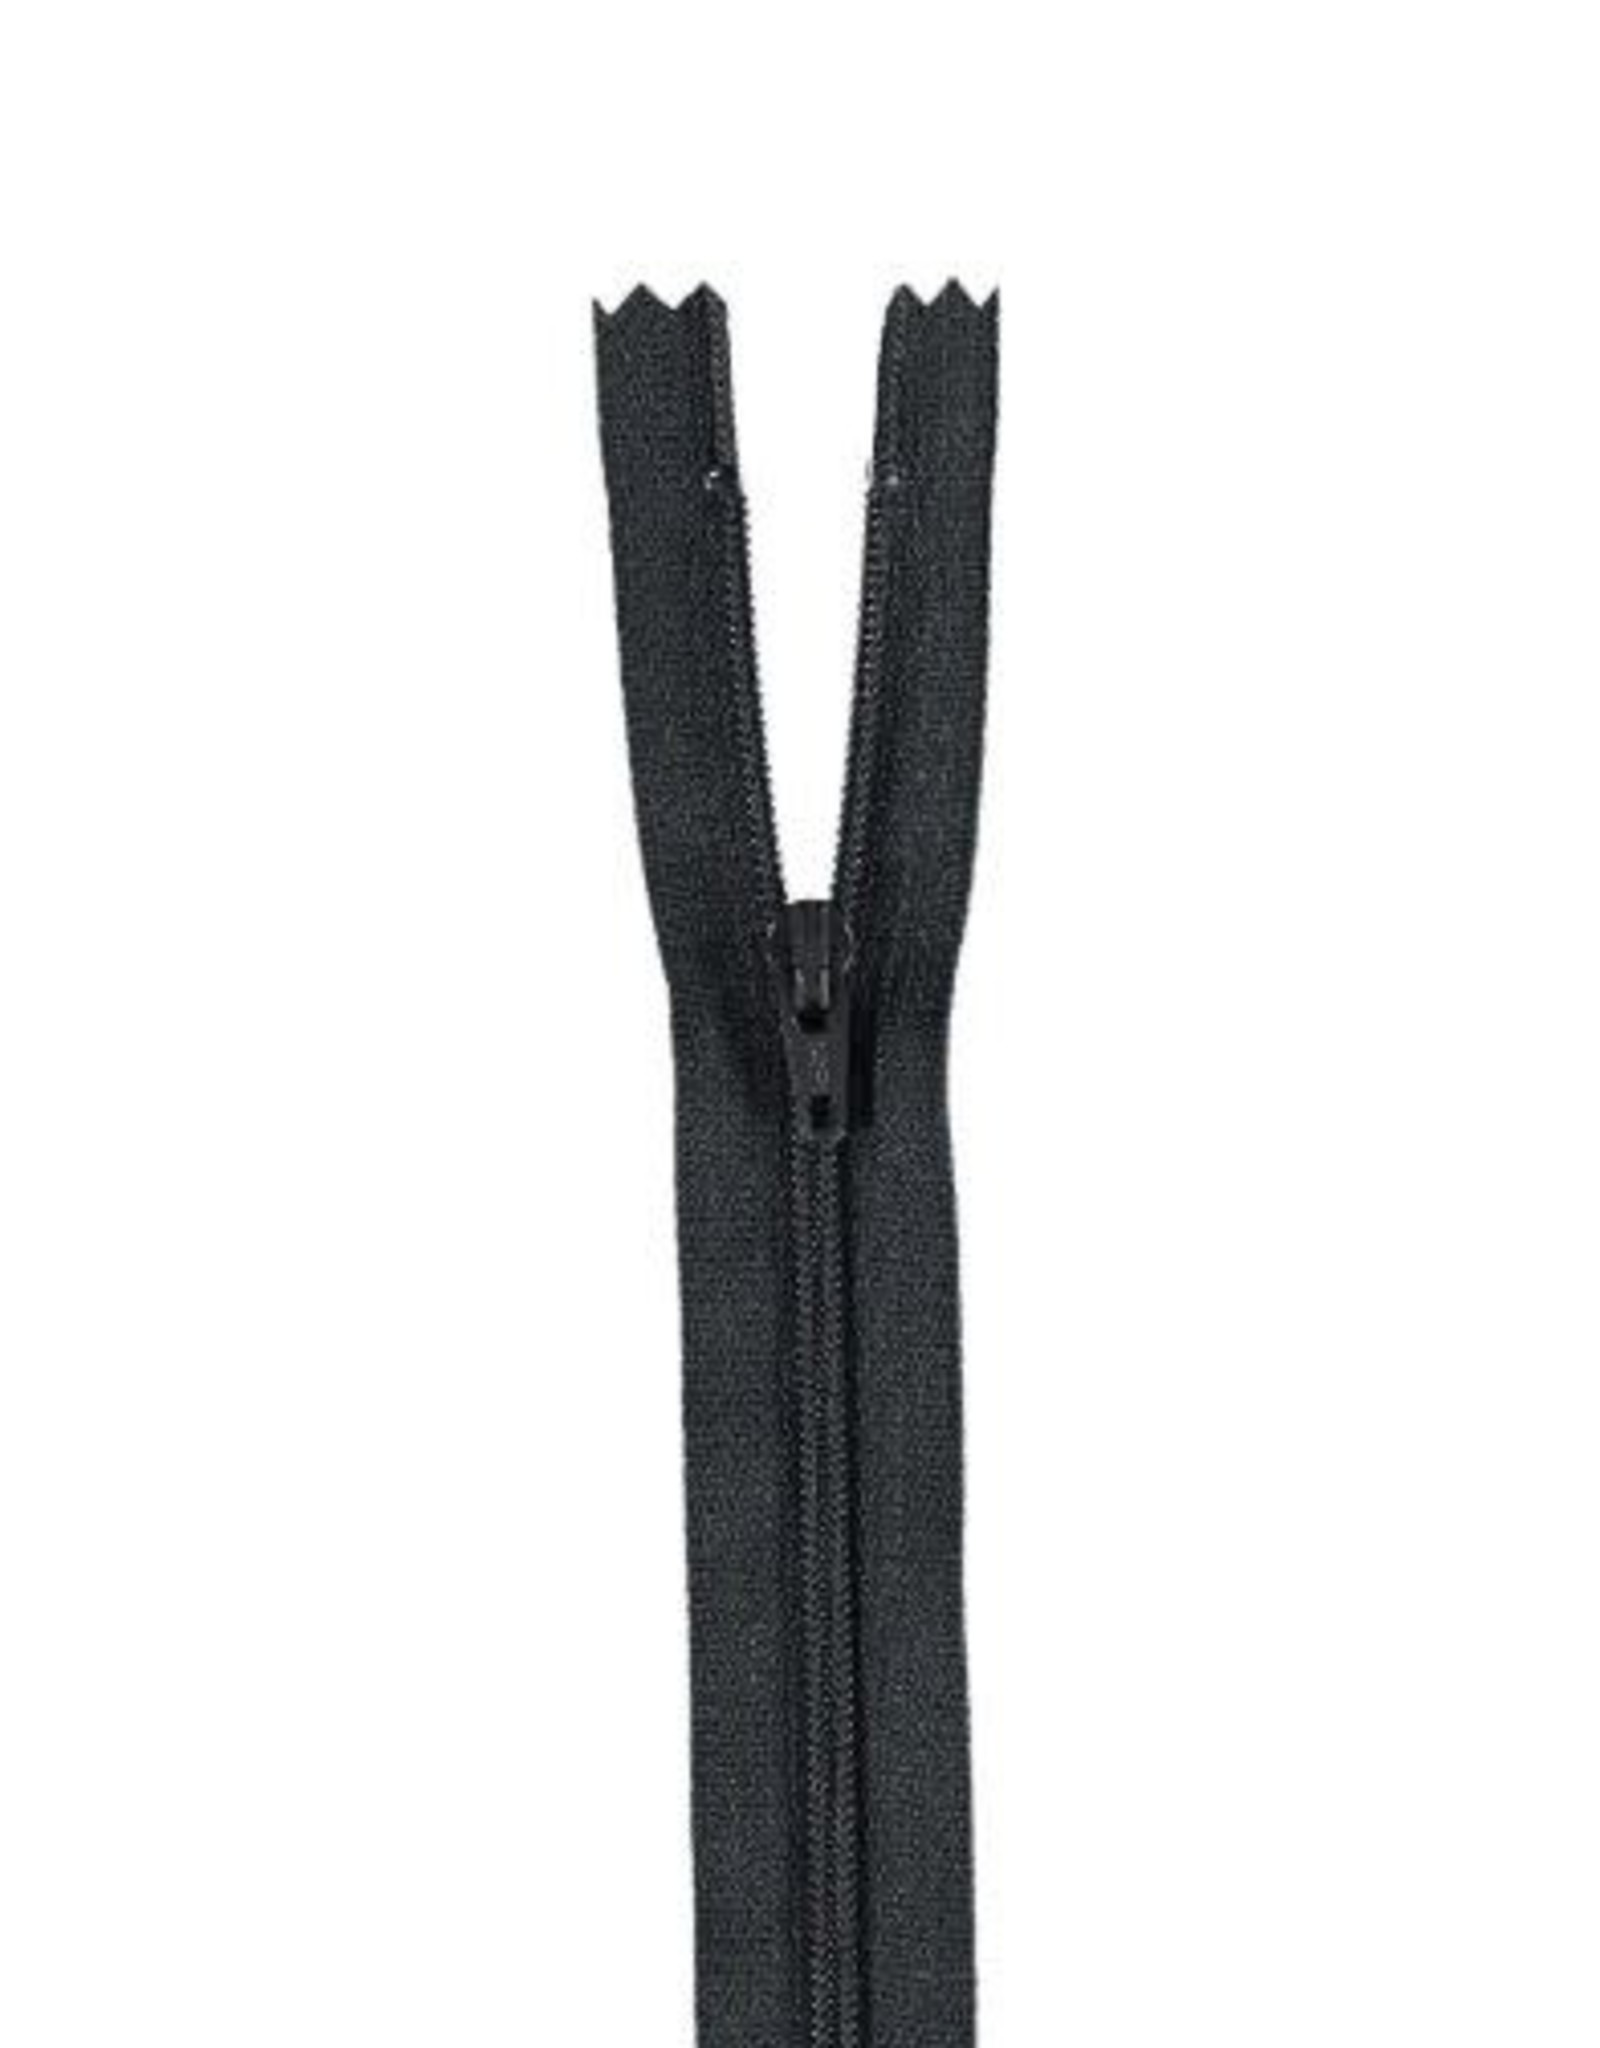 YKK Spiraalrits niet-DB 3mm antraciet 156-22cm